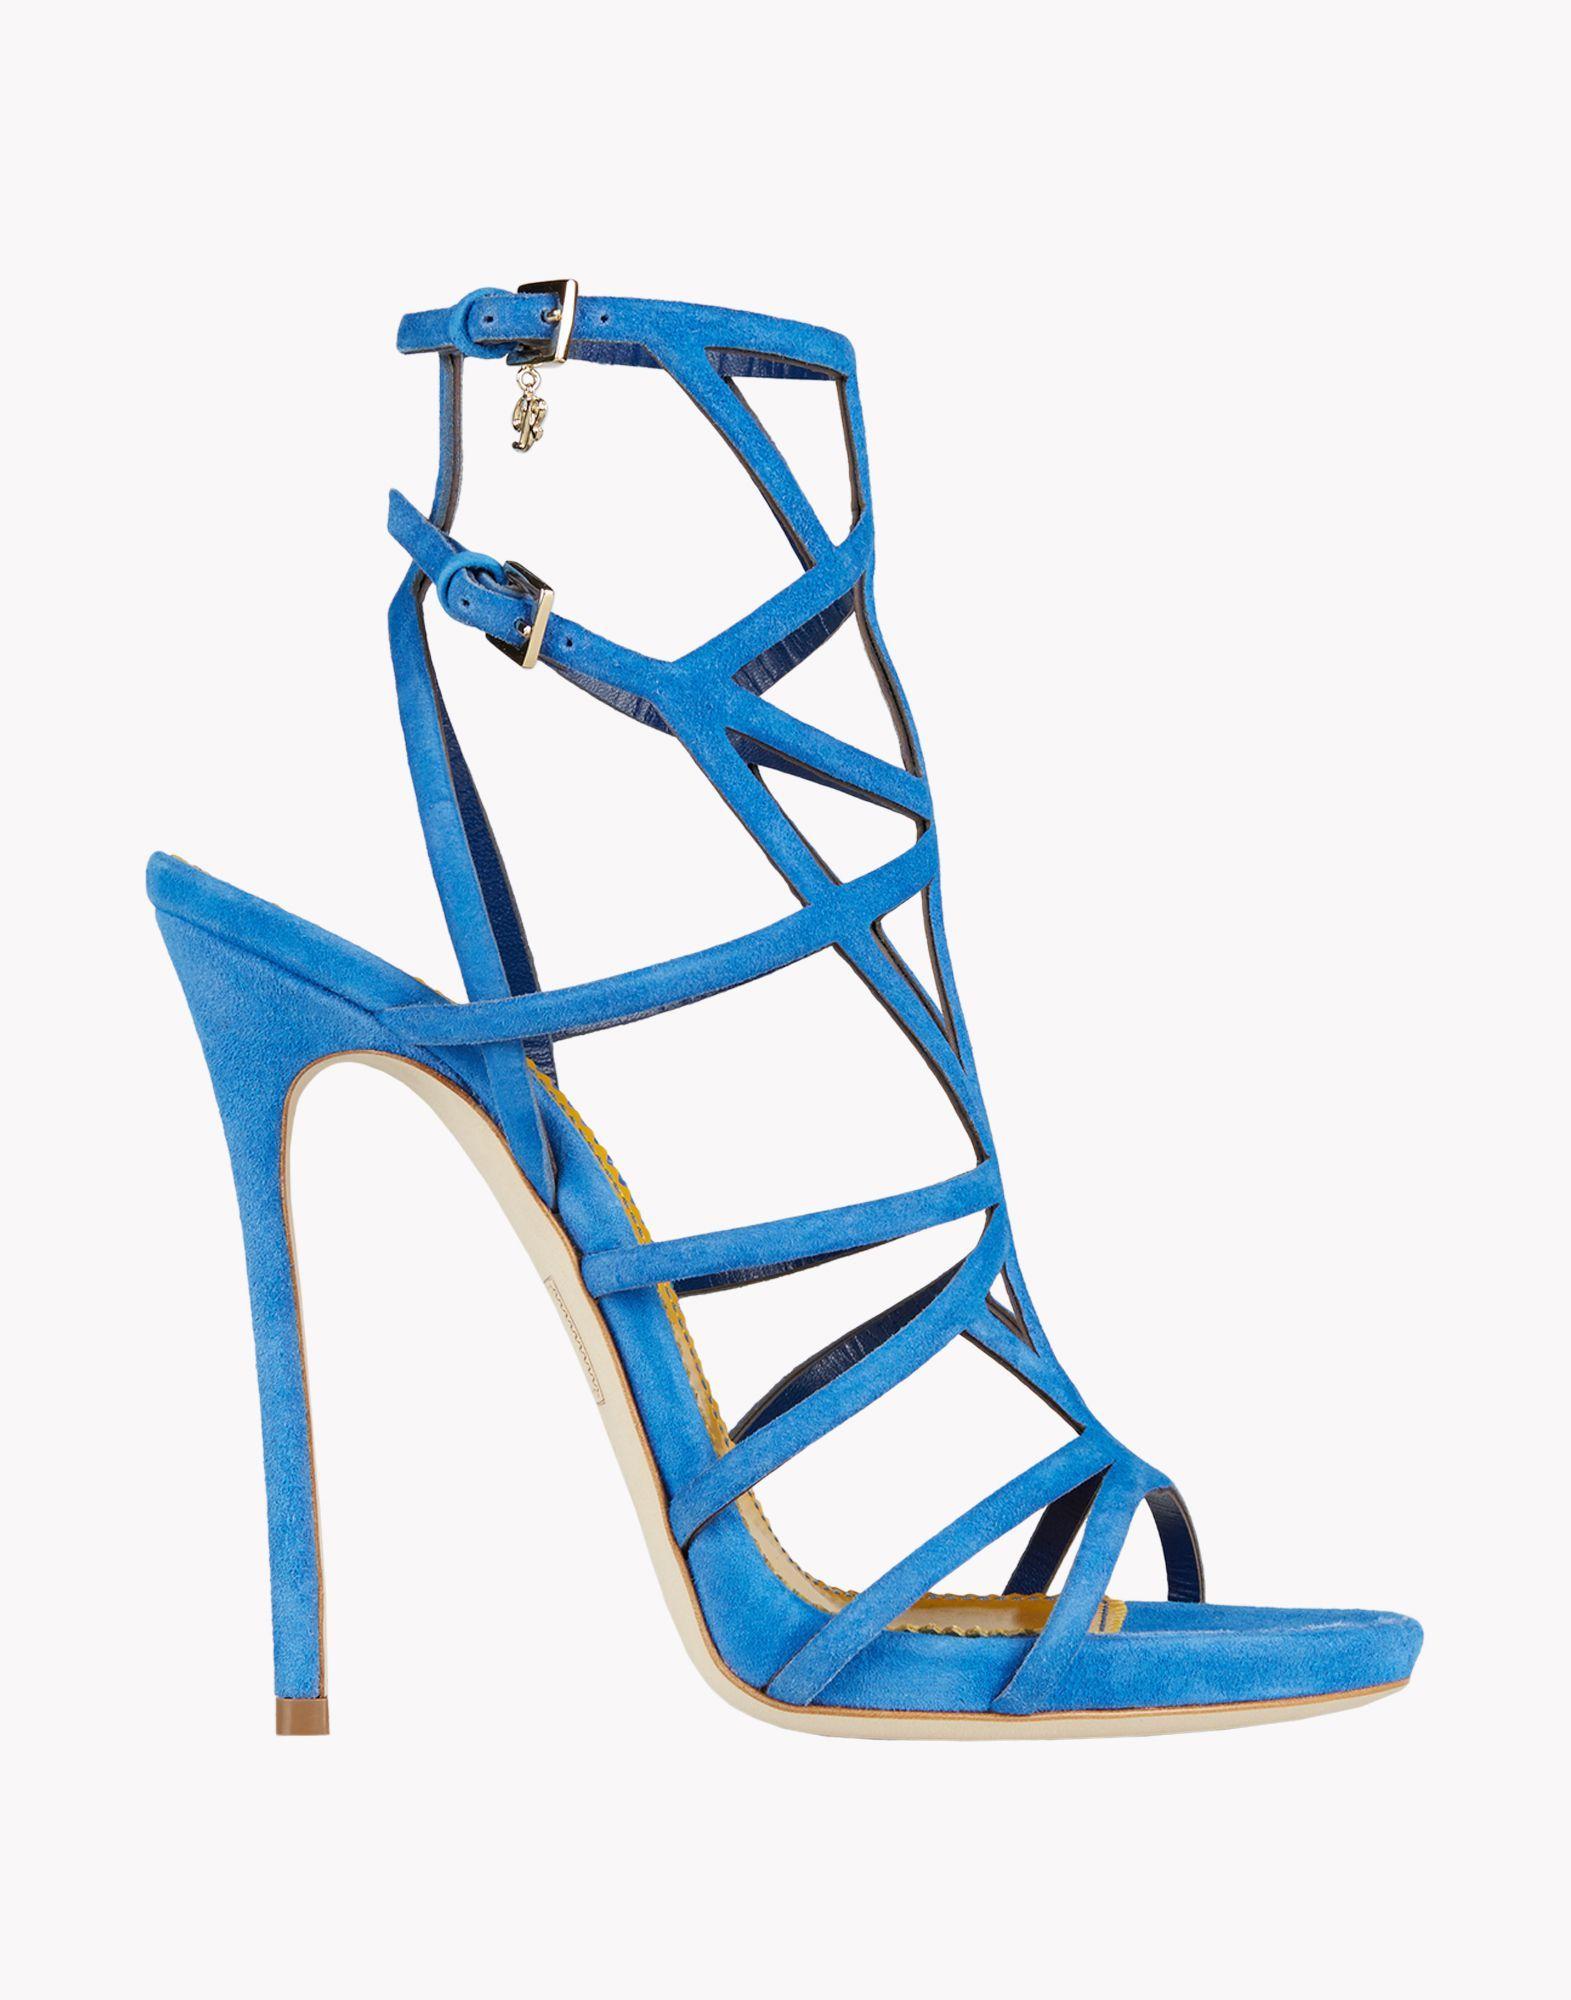 b5487636bea6e Antigone Sandals - High Heeled Sandals Women - Dsquared2 Official Online  Store